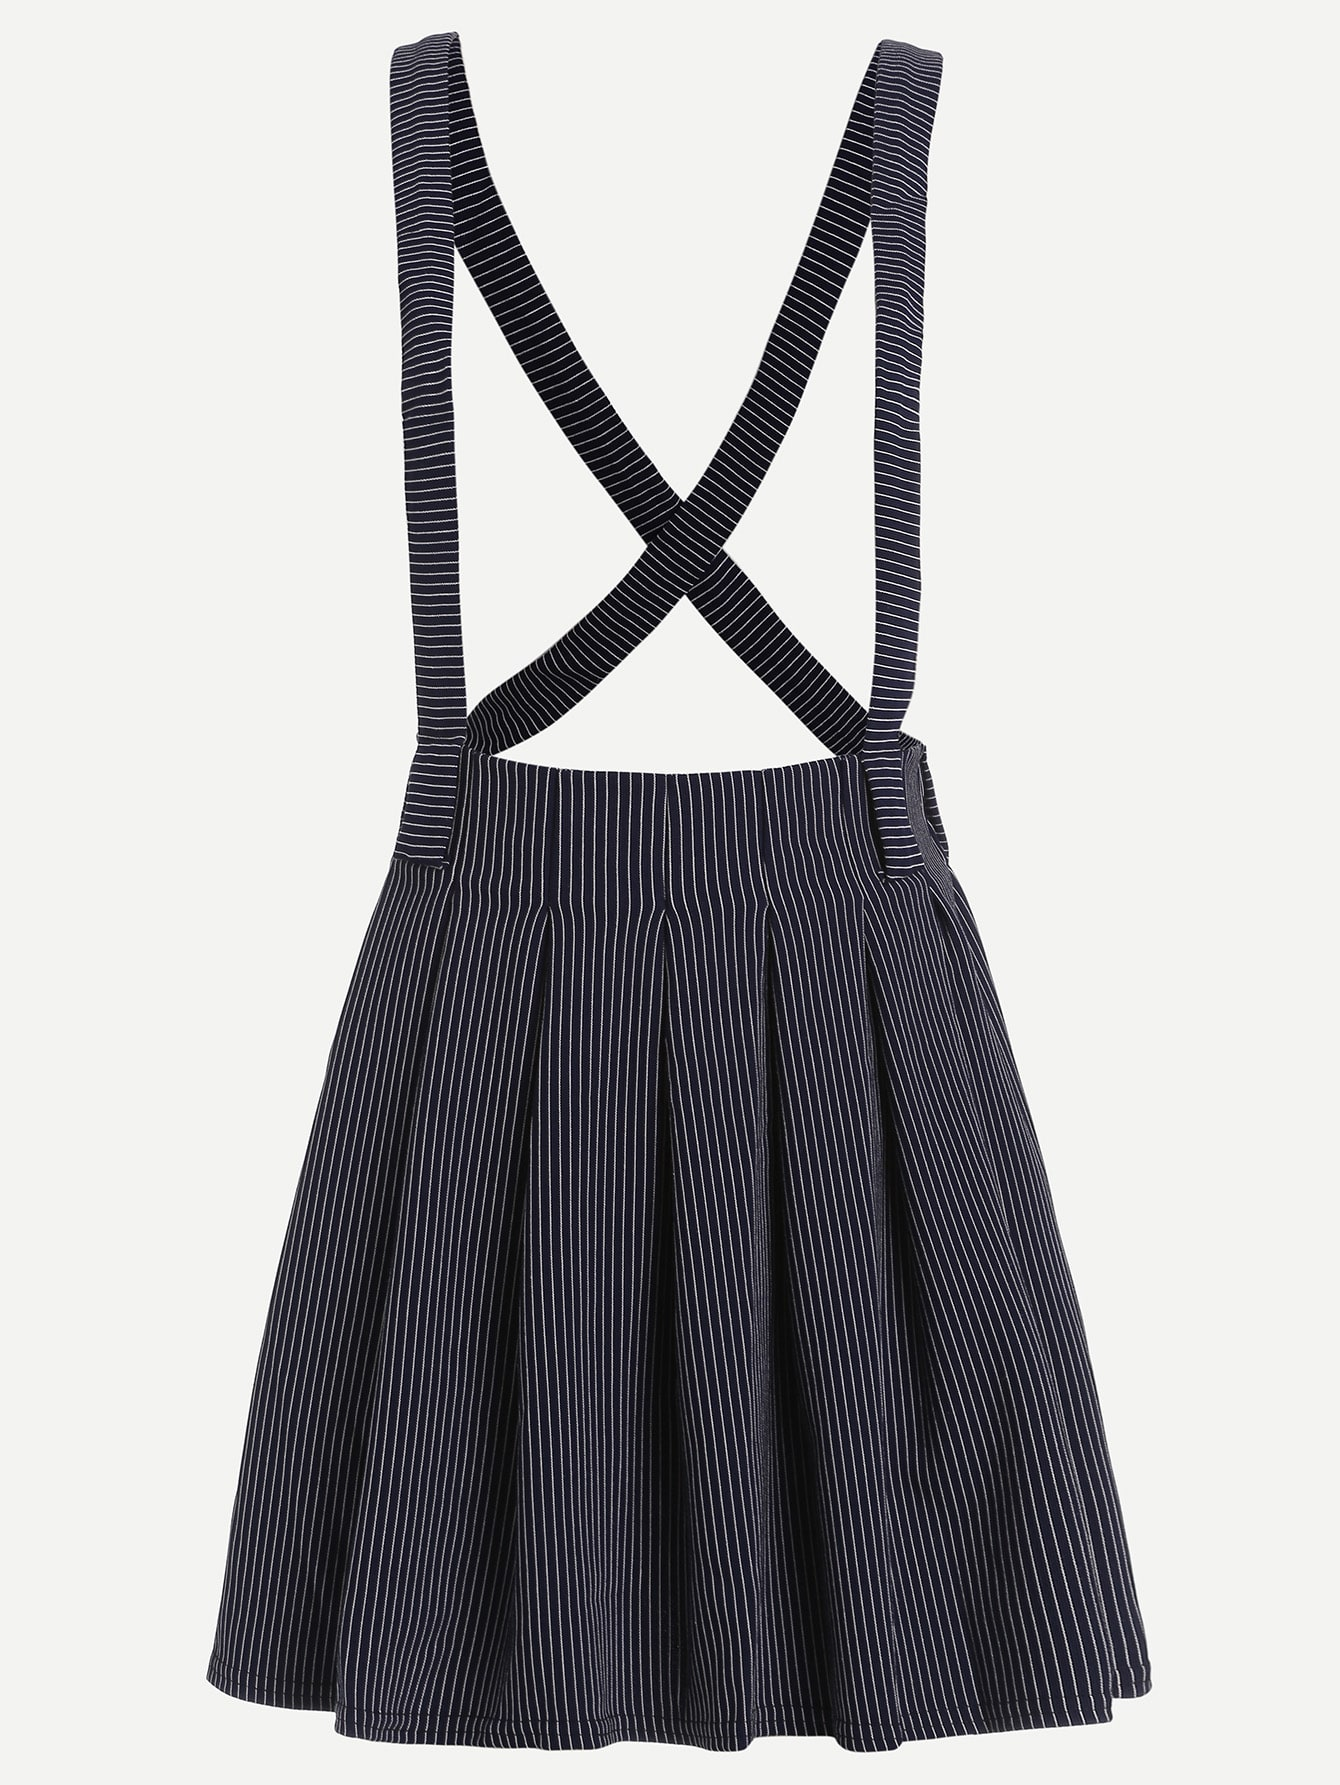 Navy Striped Suspender Pleated Skirt